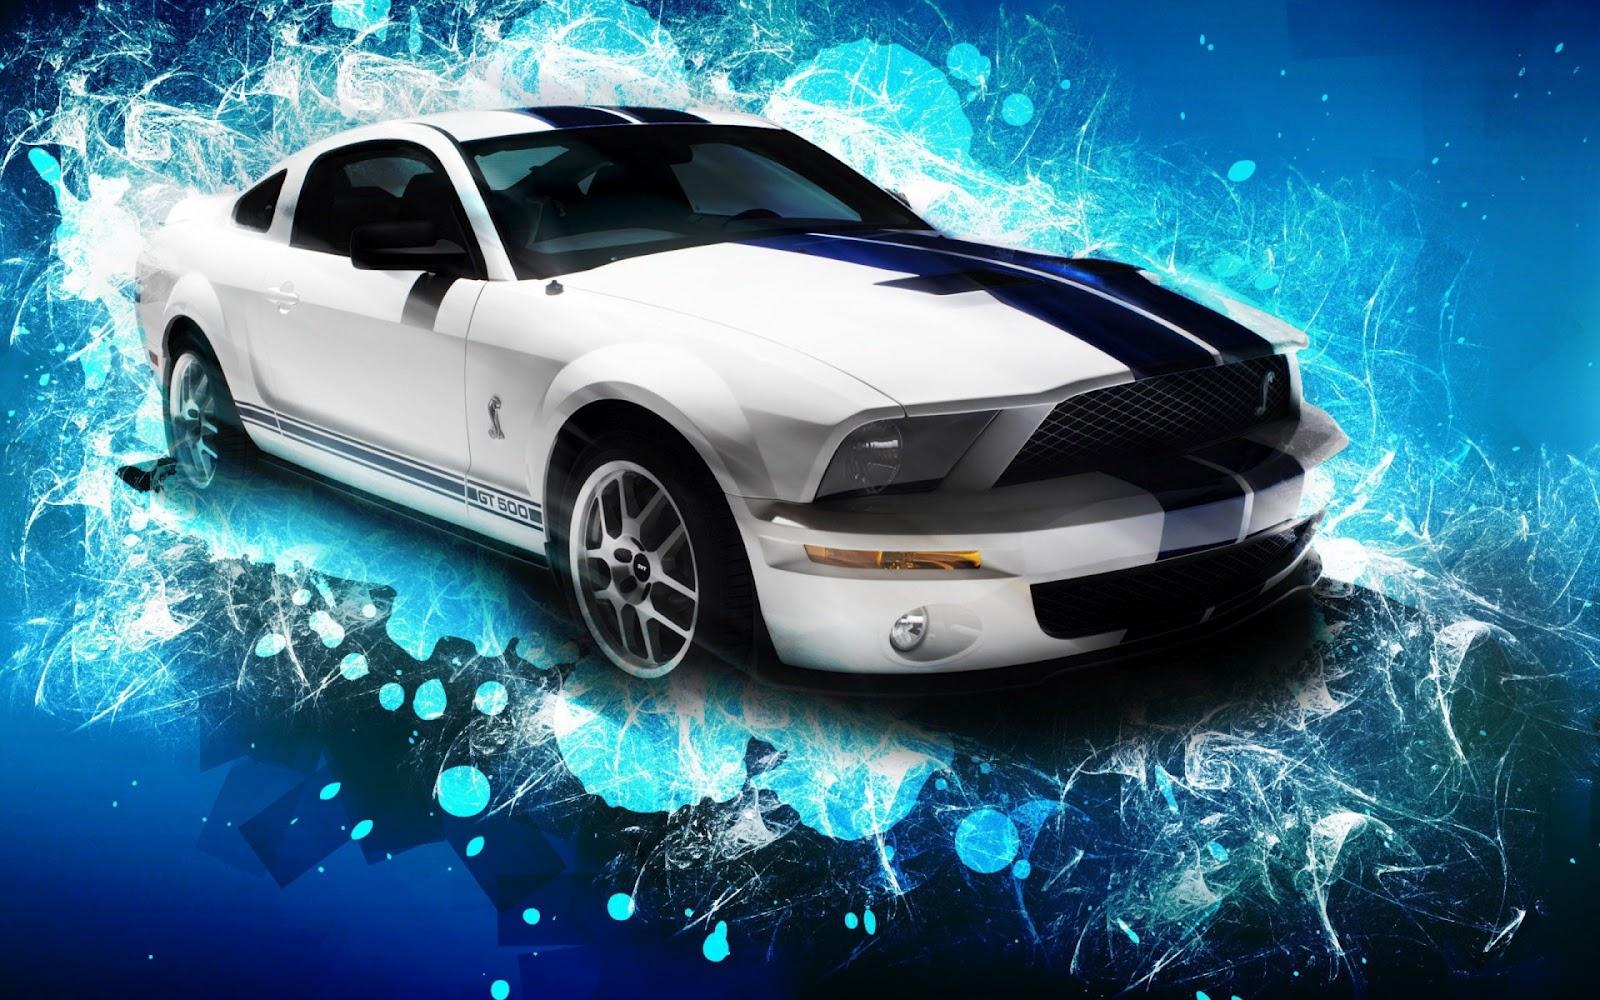 http://1.bp.blogspot.com/-4fKcrBsRXWU/T3Ke-TCSXpI/AAAAAAAAA5s/vO9pNZVLXiA/s1600/Dream_Car_Mustang_1920x1440.jpg